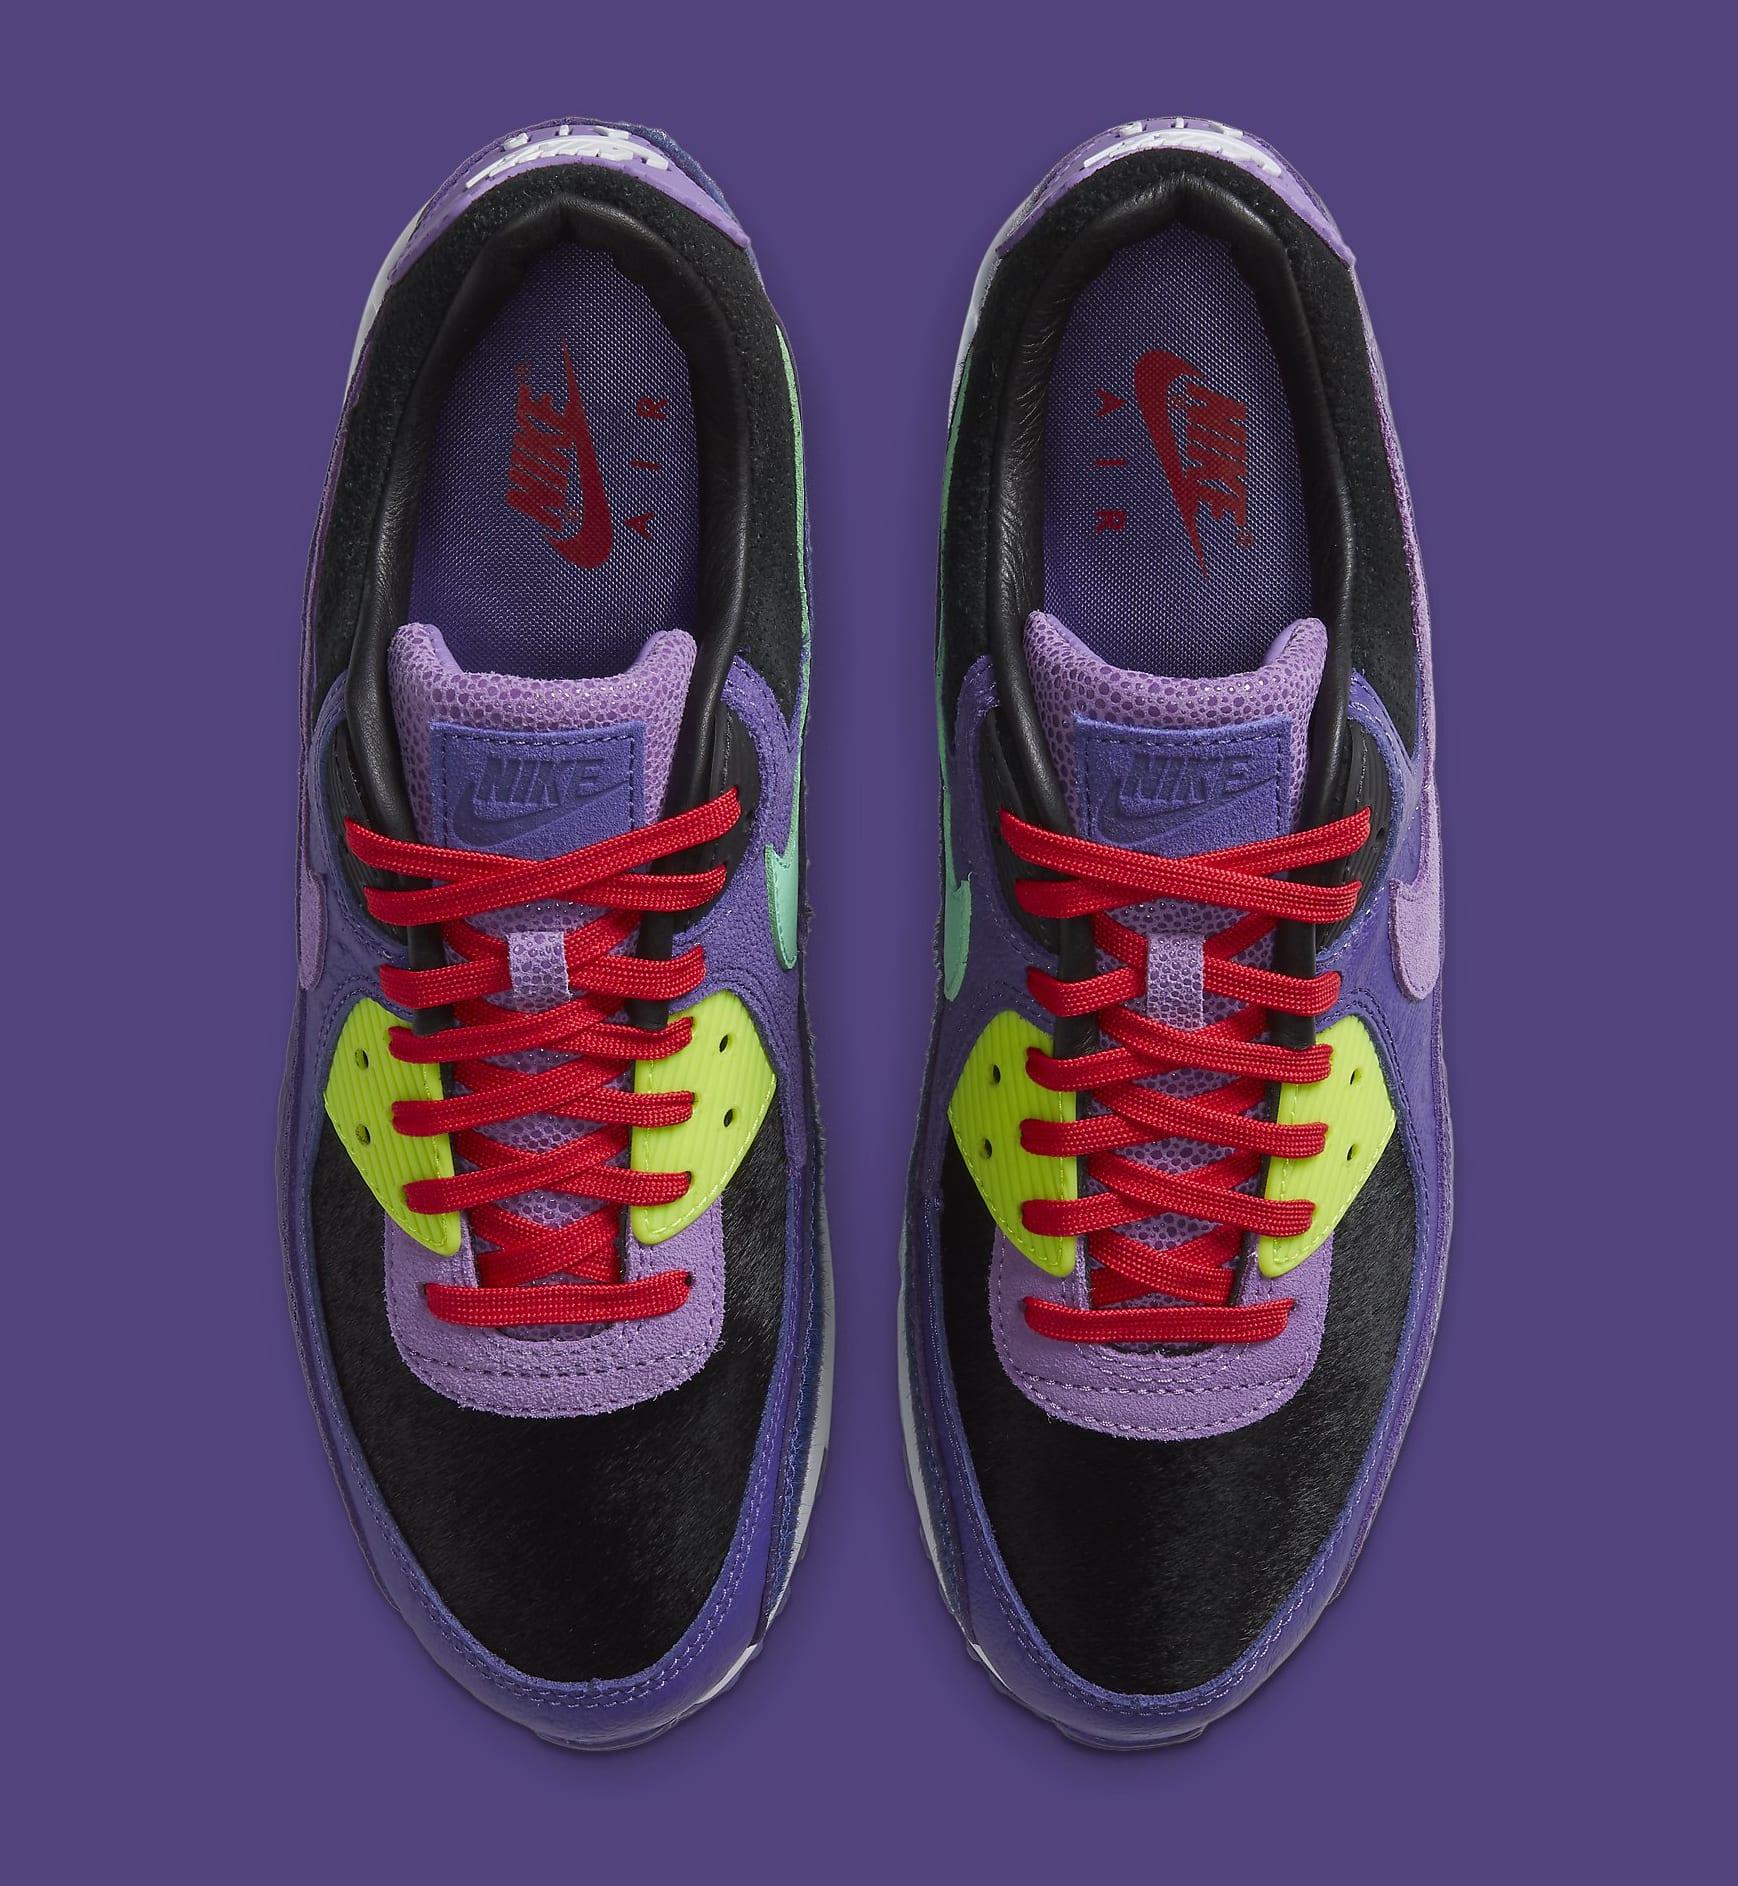 Nike Air Max 90 'Violet Blend' CZ5588-001 Top